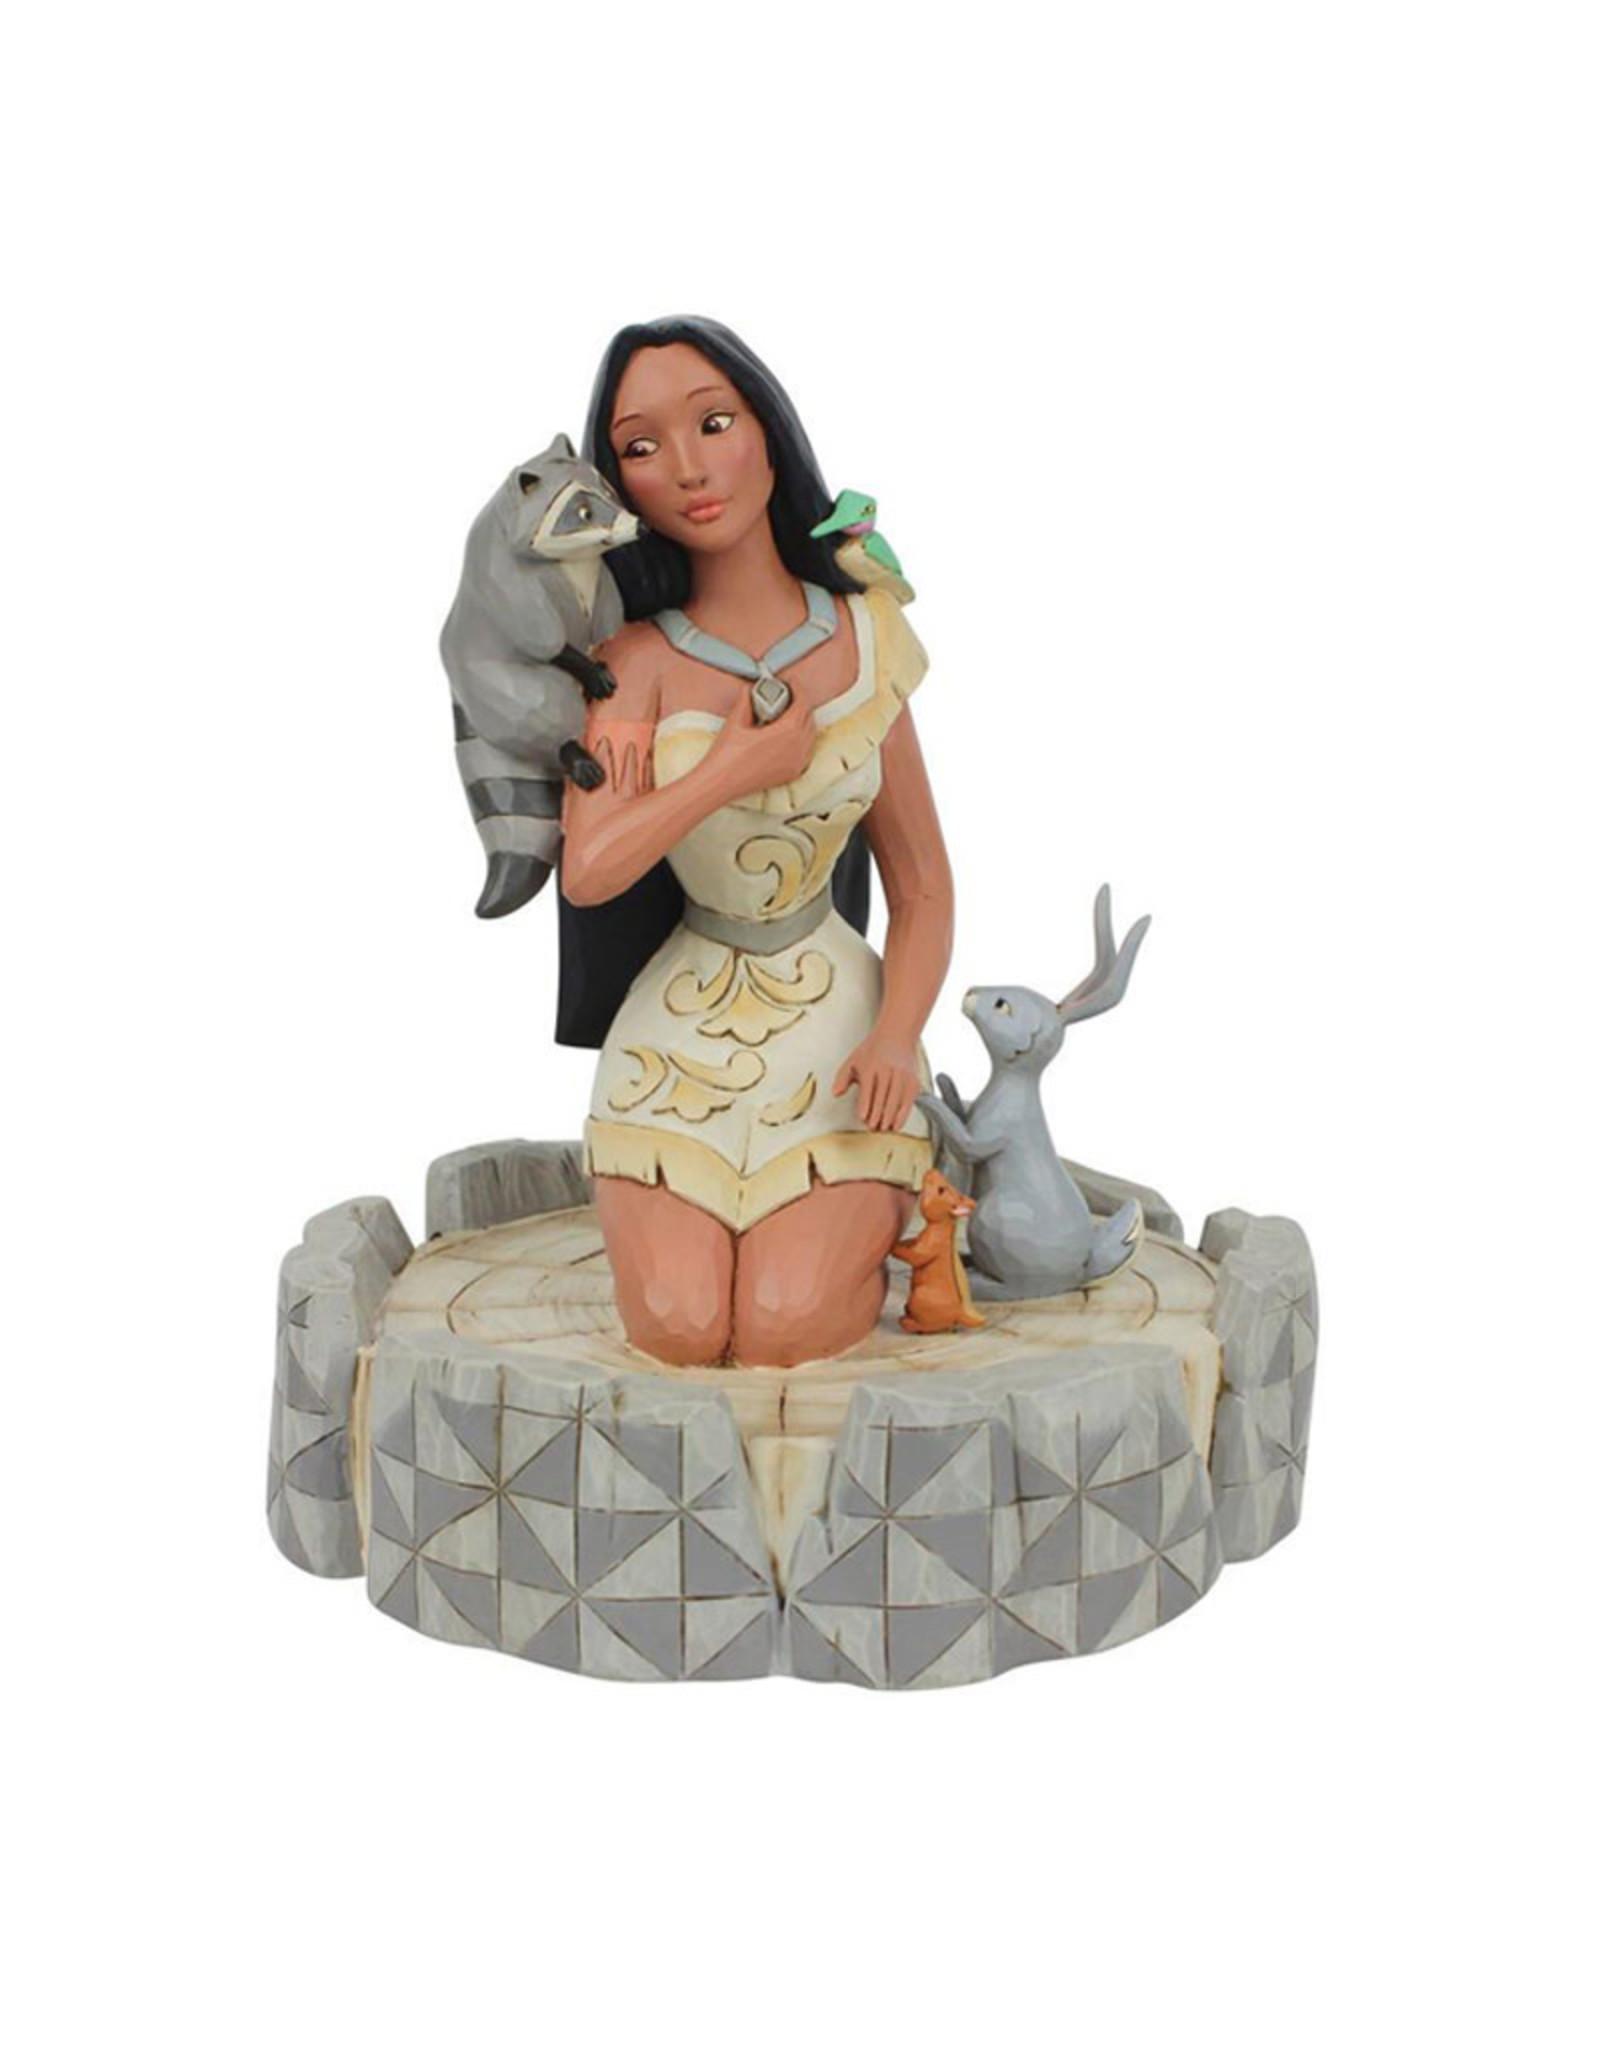 Disney Disney ( Disney Traditions Figurine ) Pocahontas & Friends